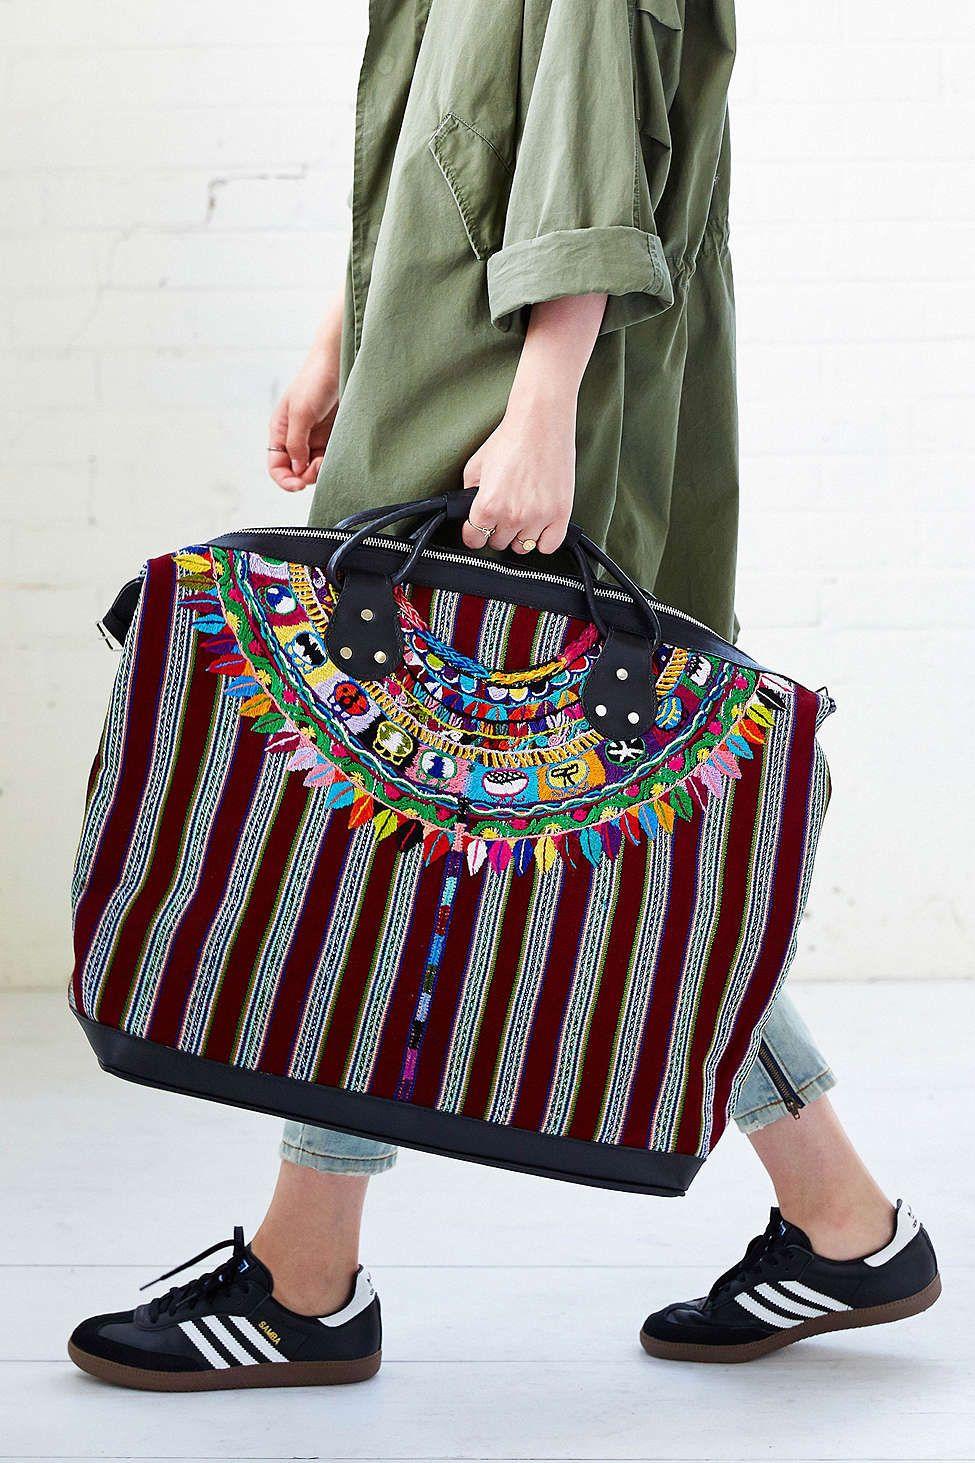 e04200dc99 Stela 9 Isabel Embroidered Weekender Bag Bolsas Mochila